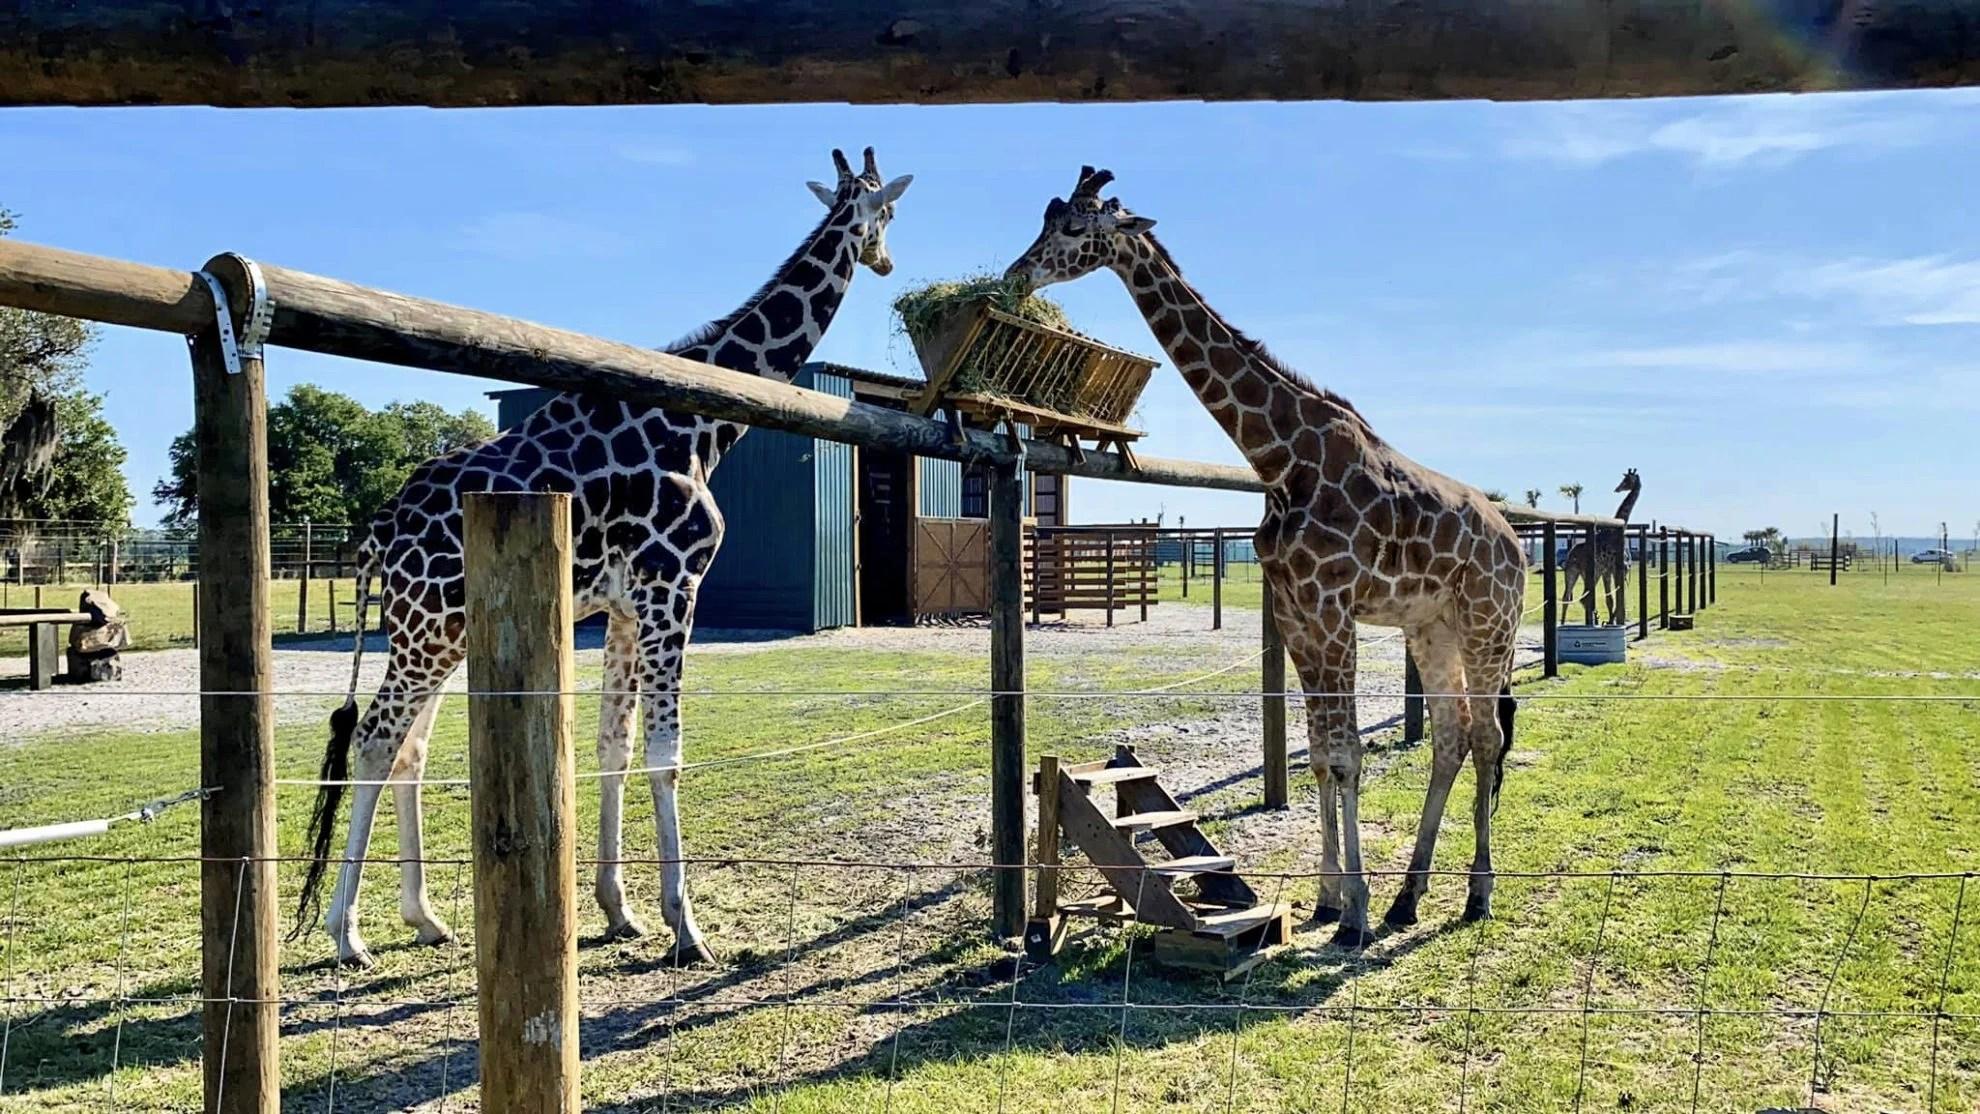 Reticulated Giraffe eating at Wild Florida Drive-Thru Safari Park